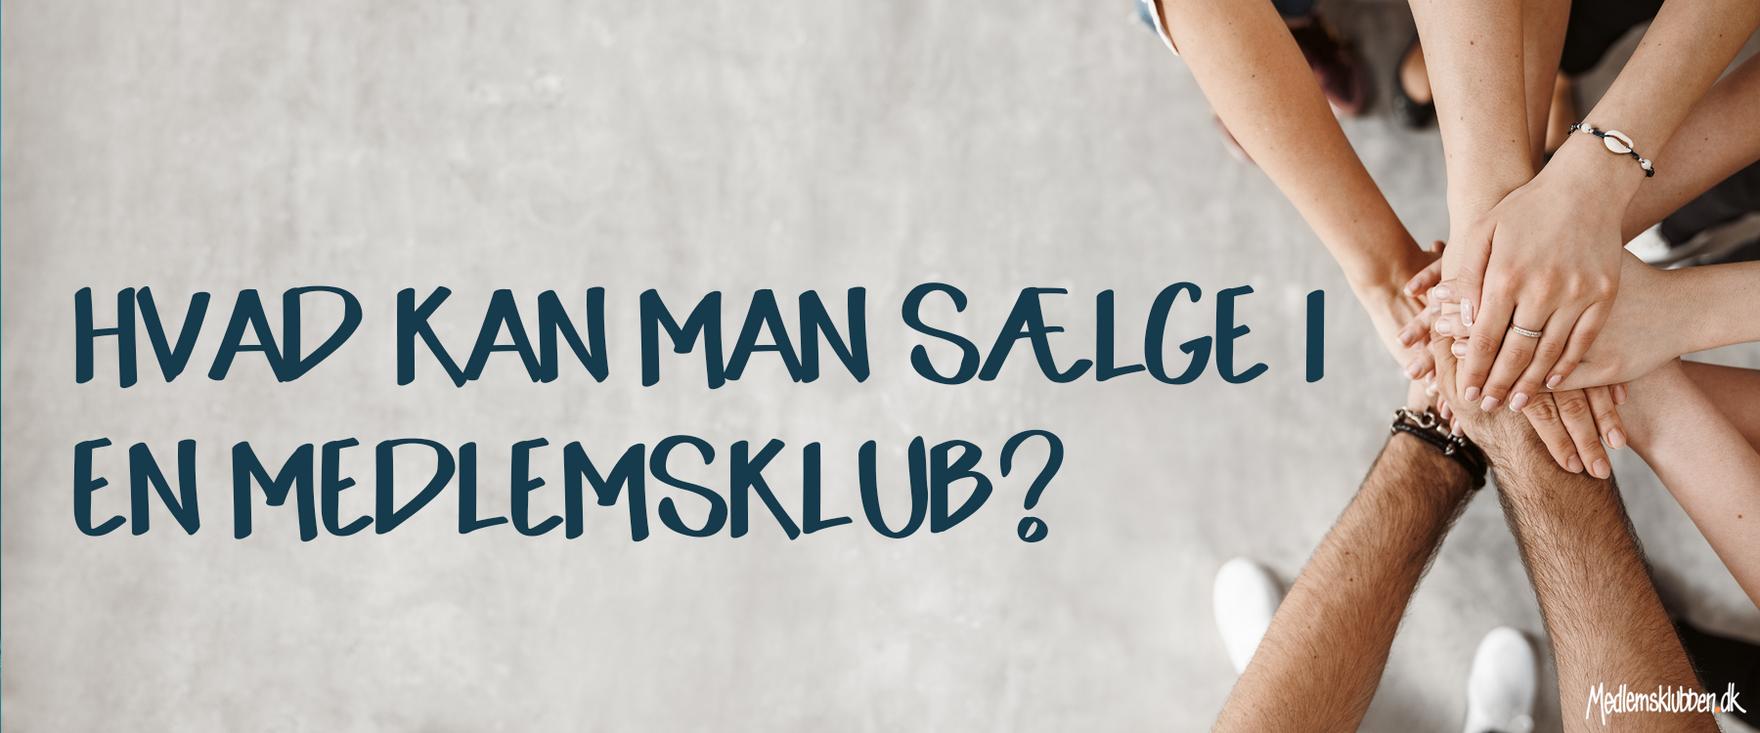 Blog_SAELGE